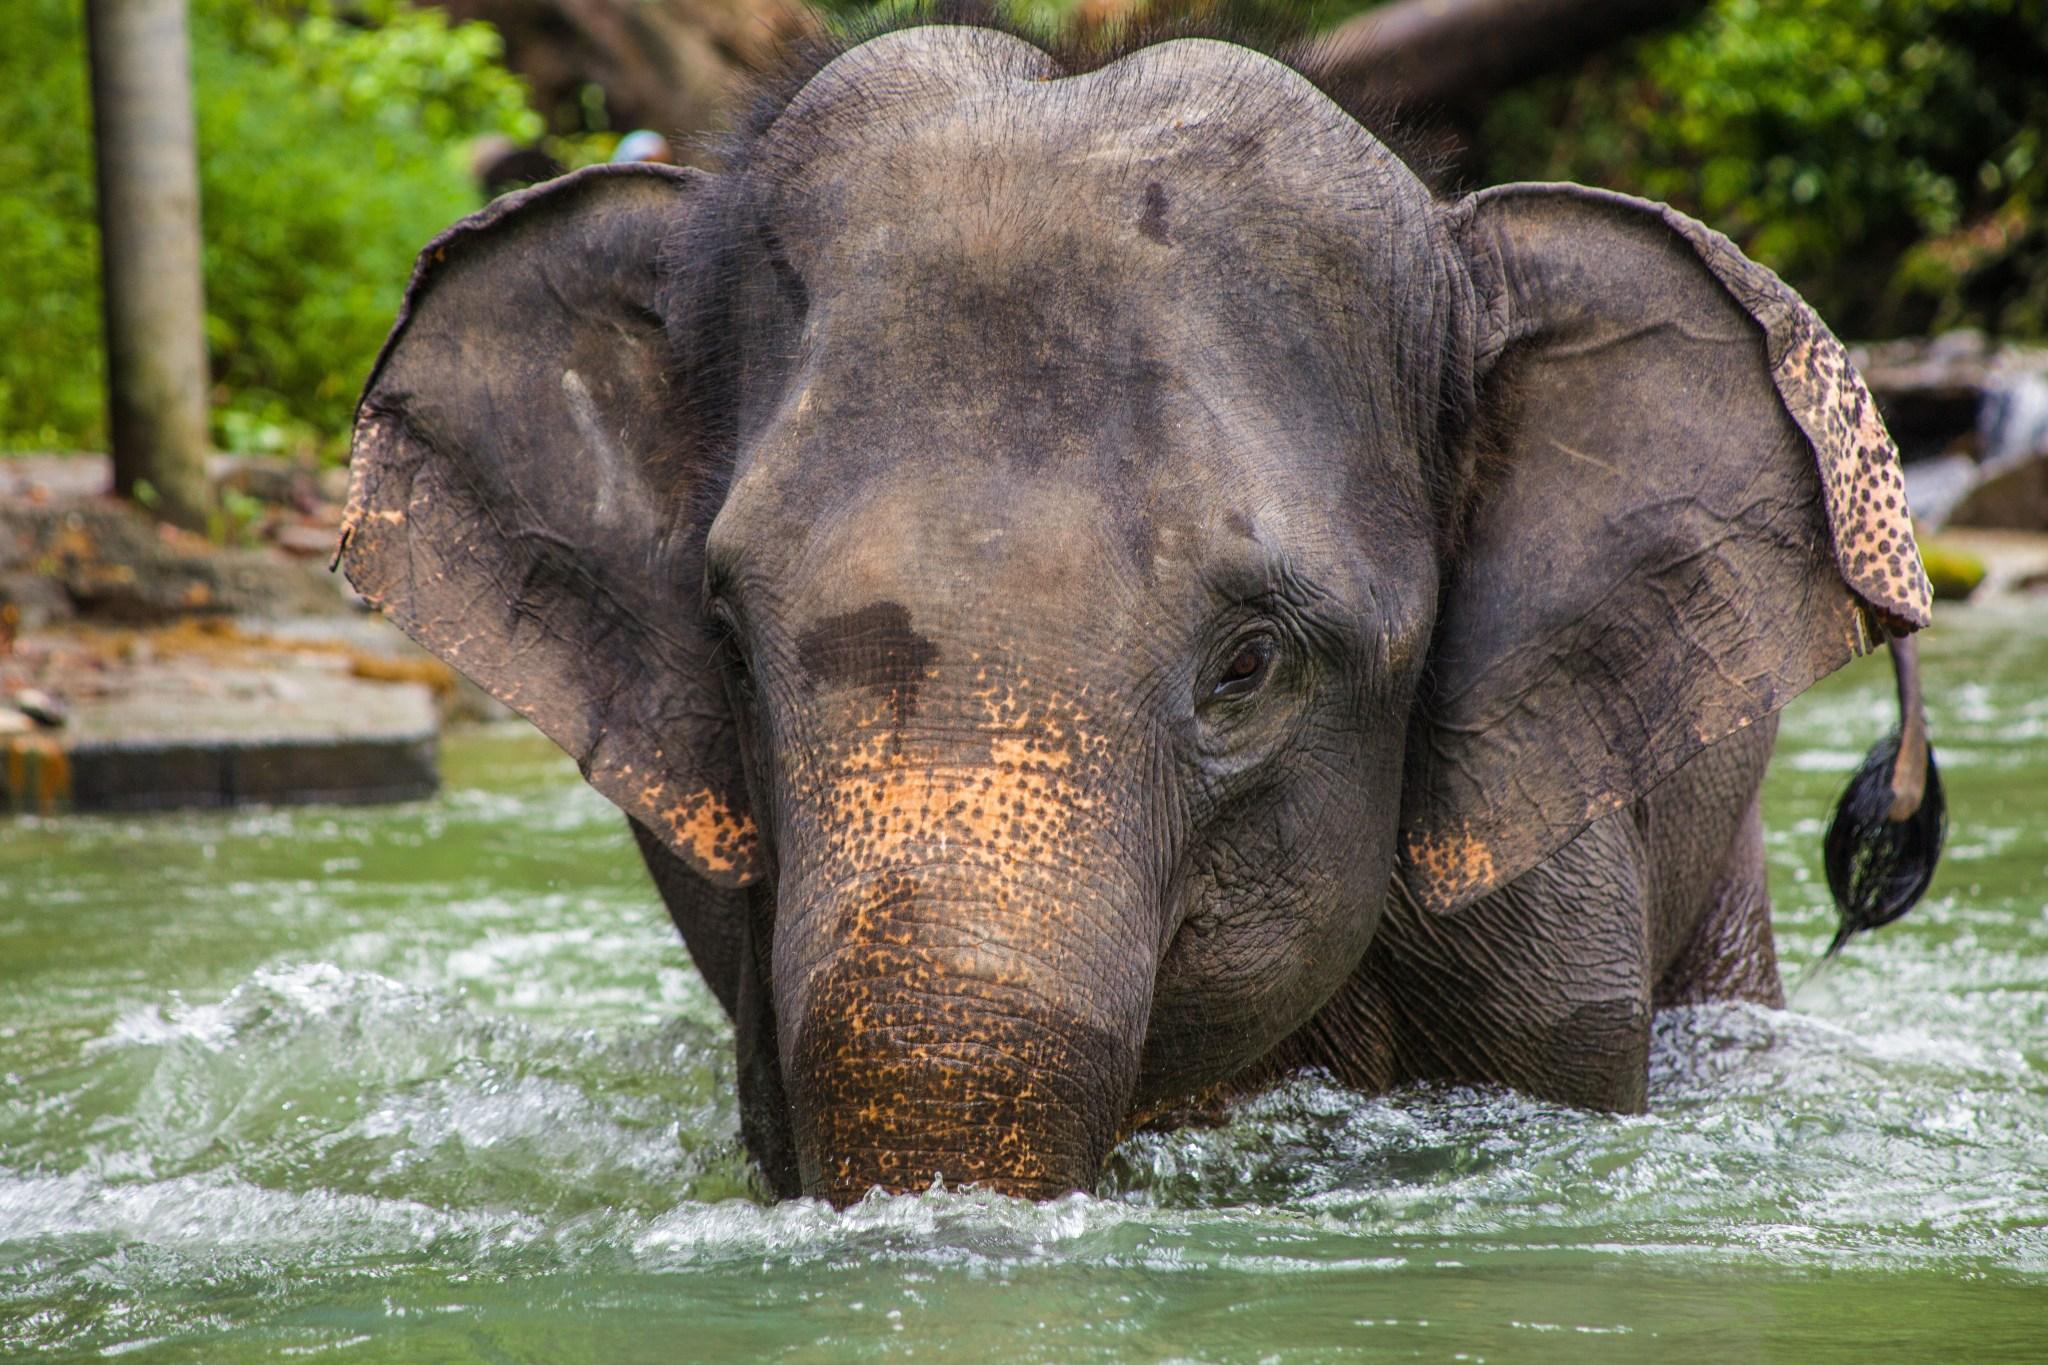 Artenschutz Elefanten, Jaguare und Haie profitieren